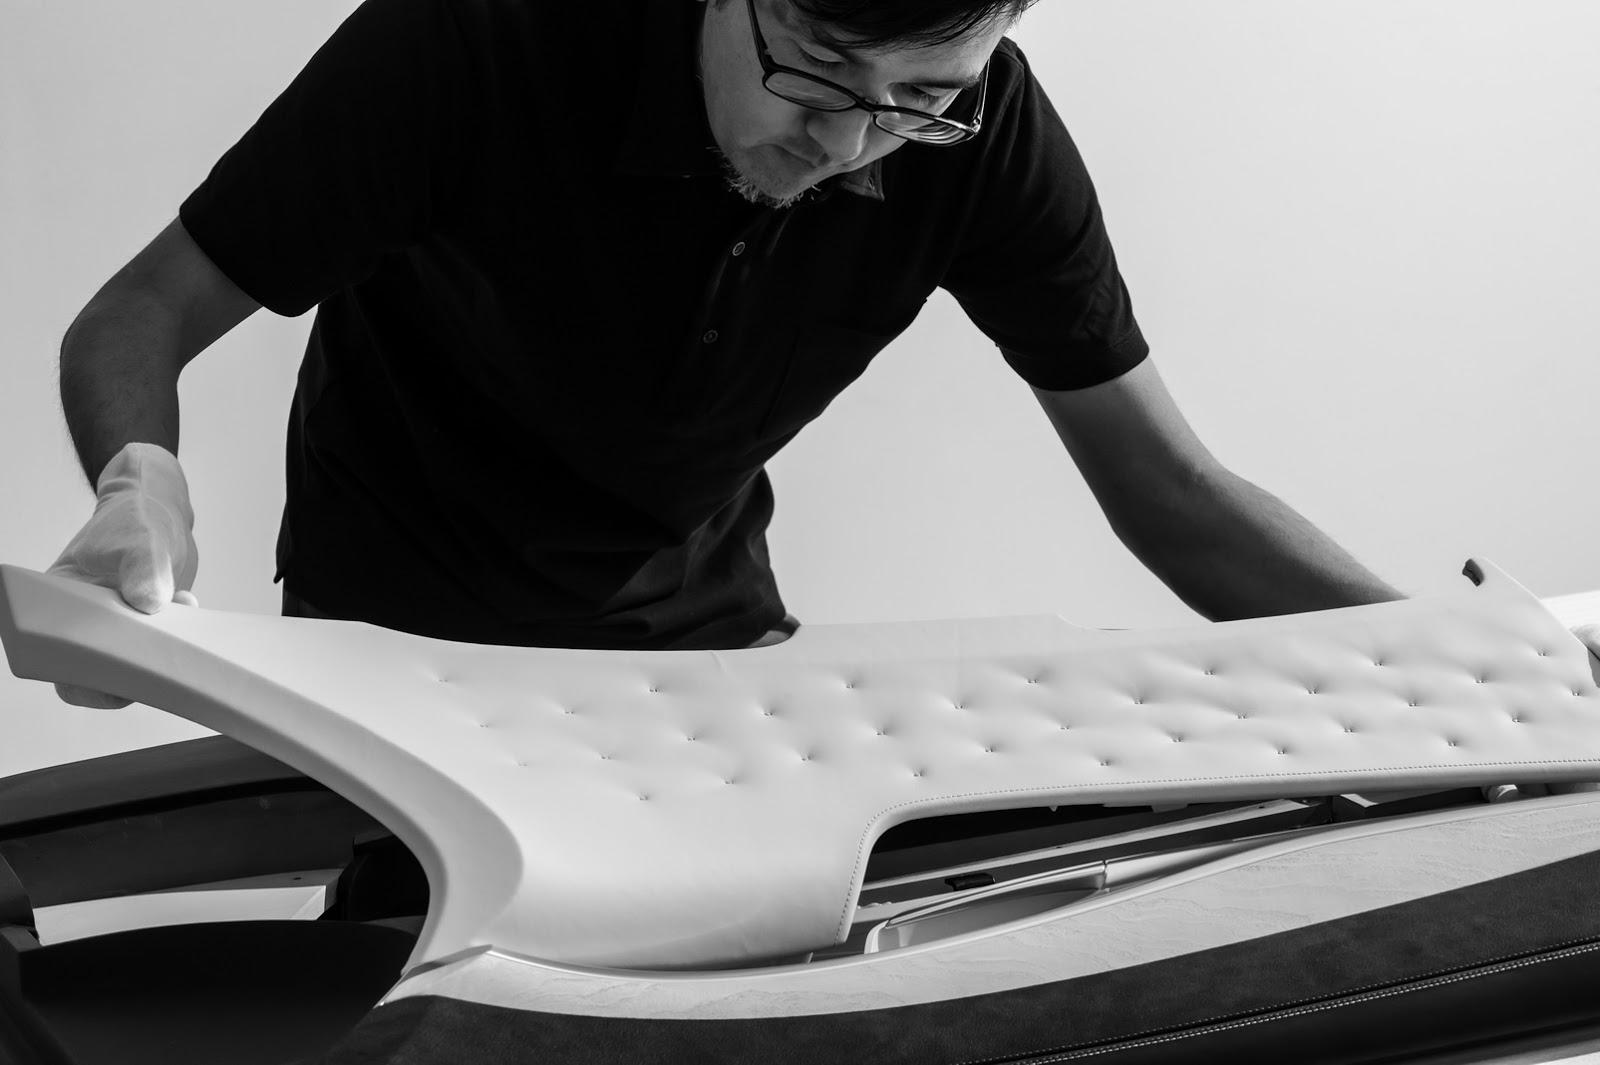 إنفينيتي تعلن عن QX50 كونسيبت بمعرض ديترويت Infinity Infiniti-qx50-concept-arrives-detroit-28